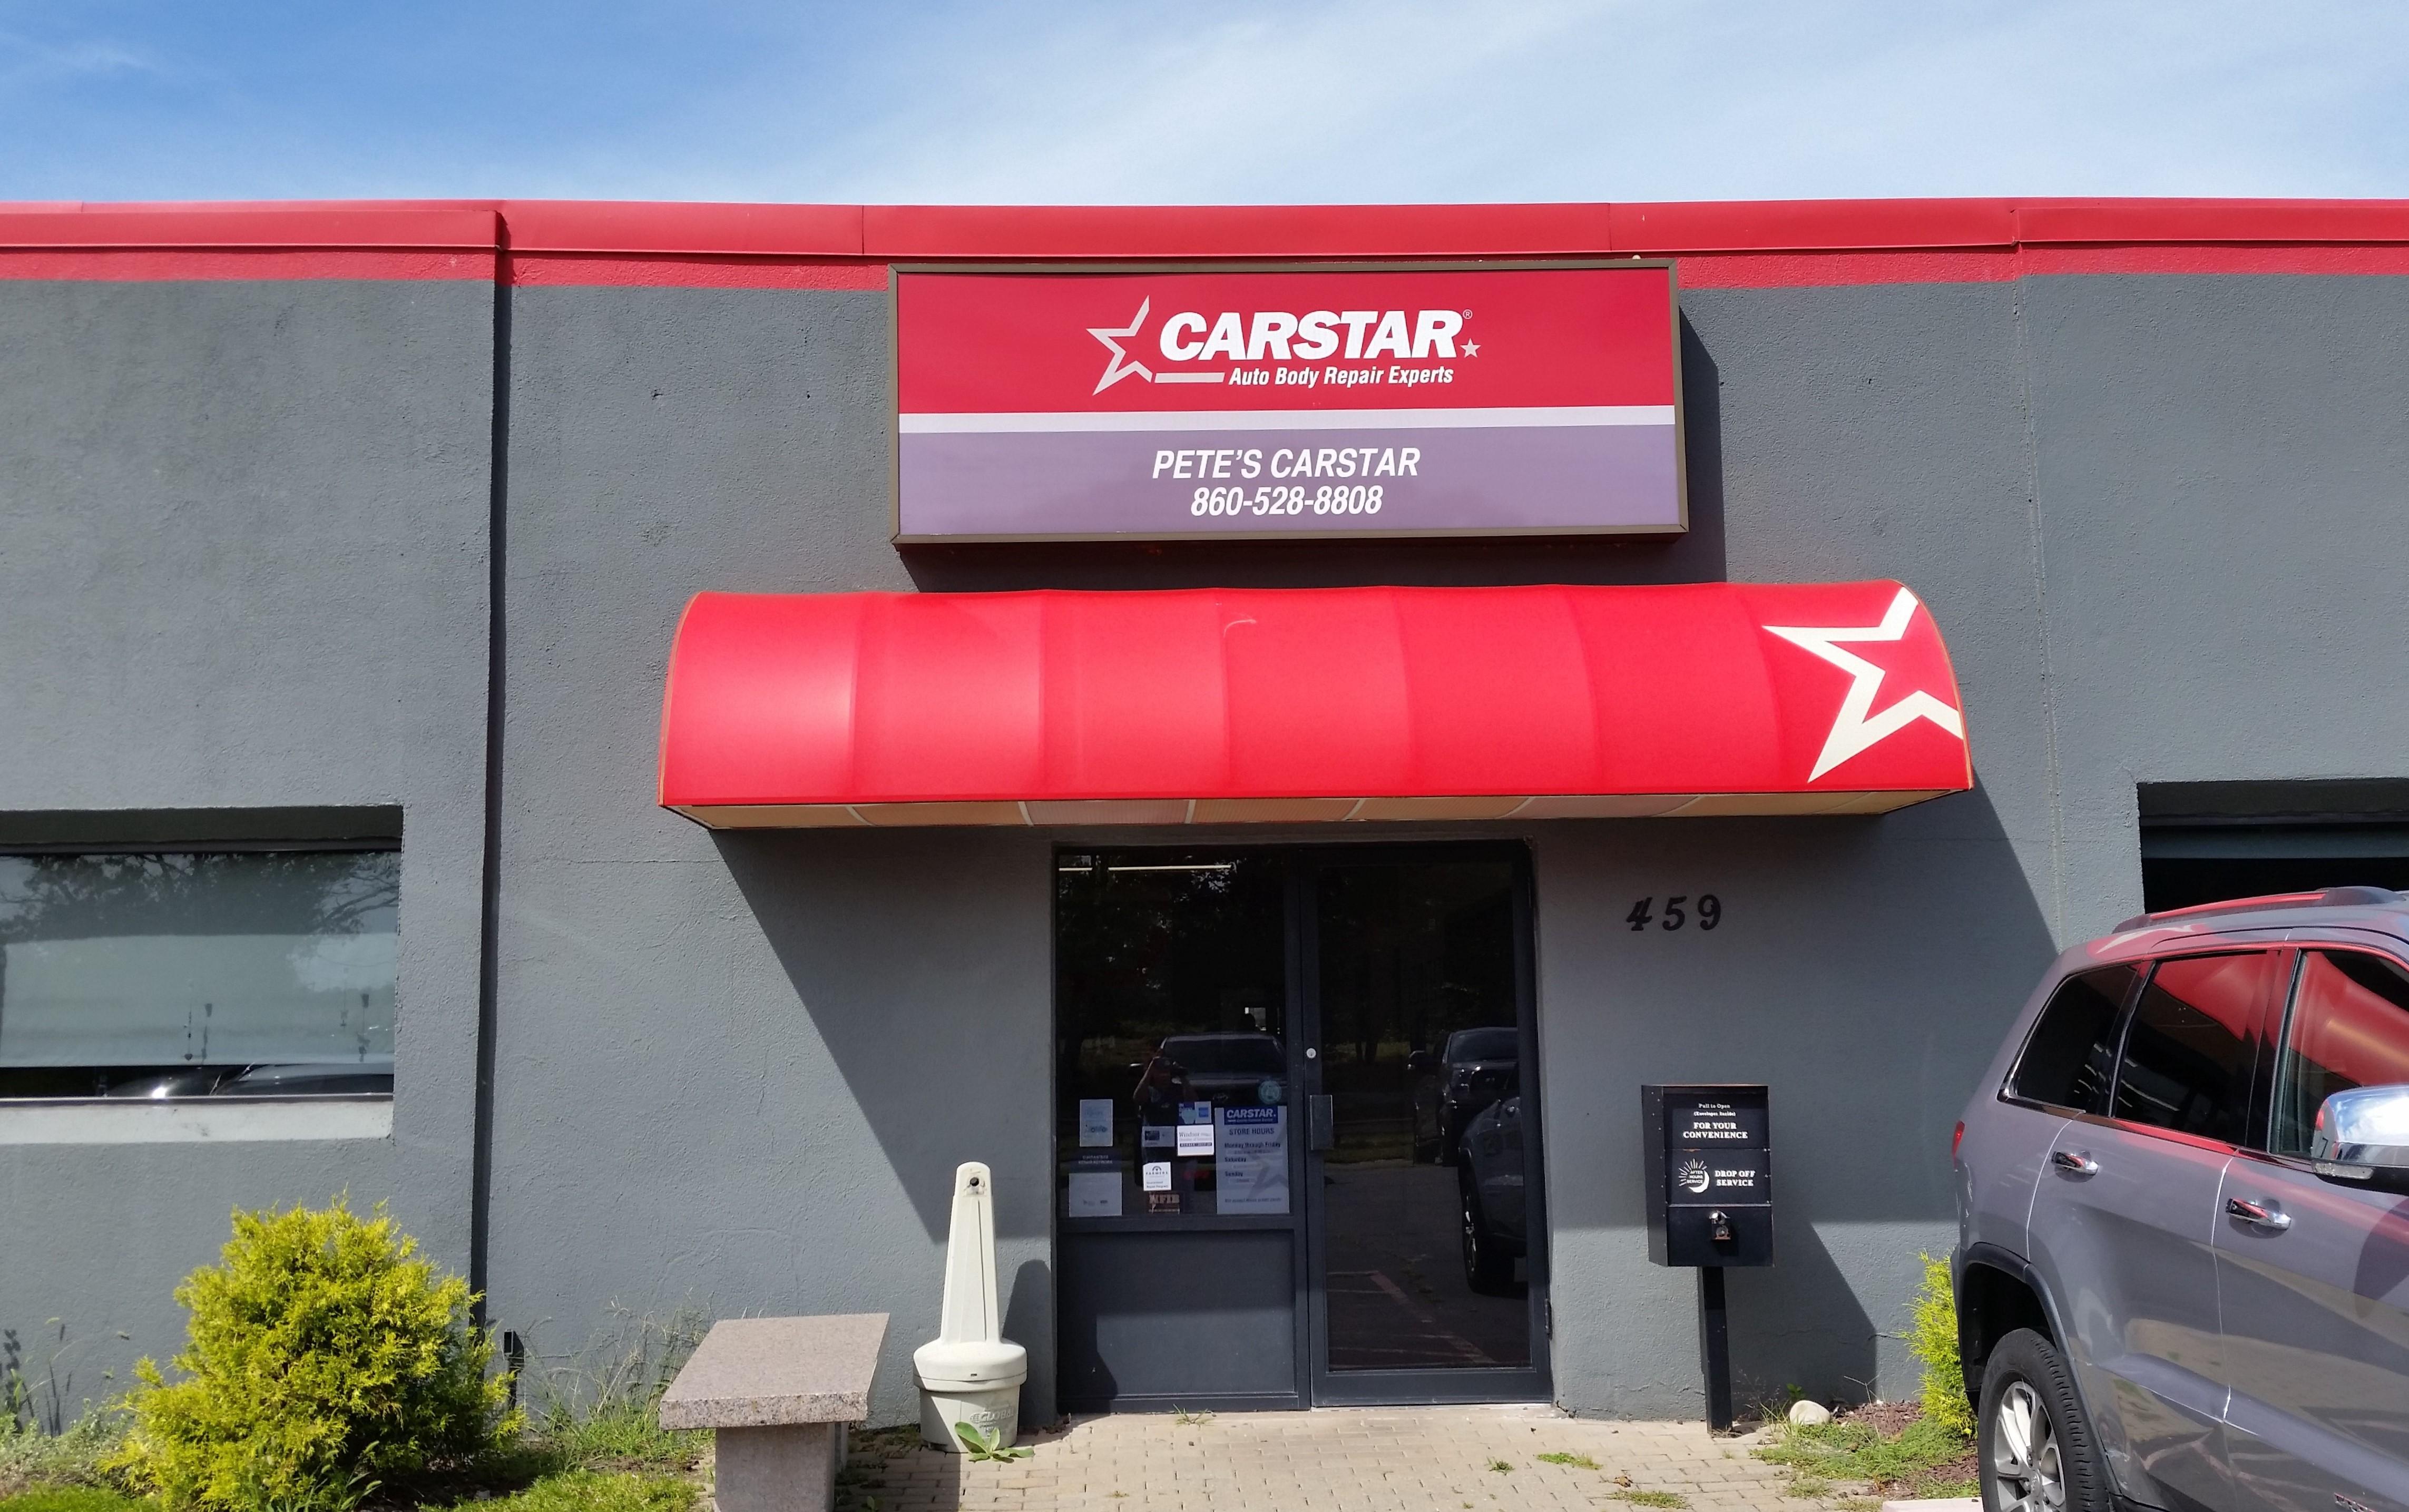 Carstar | Exterior Pete's CARSTAR South Windsor CT